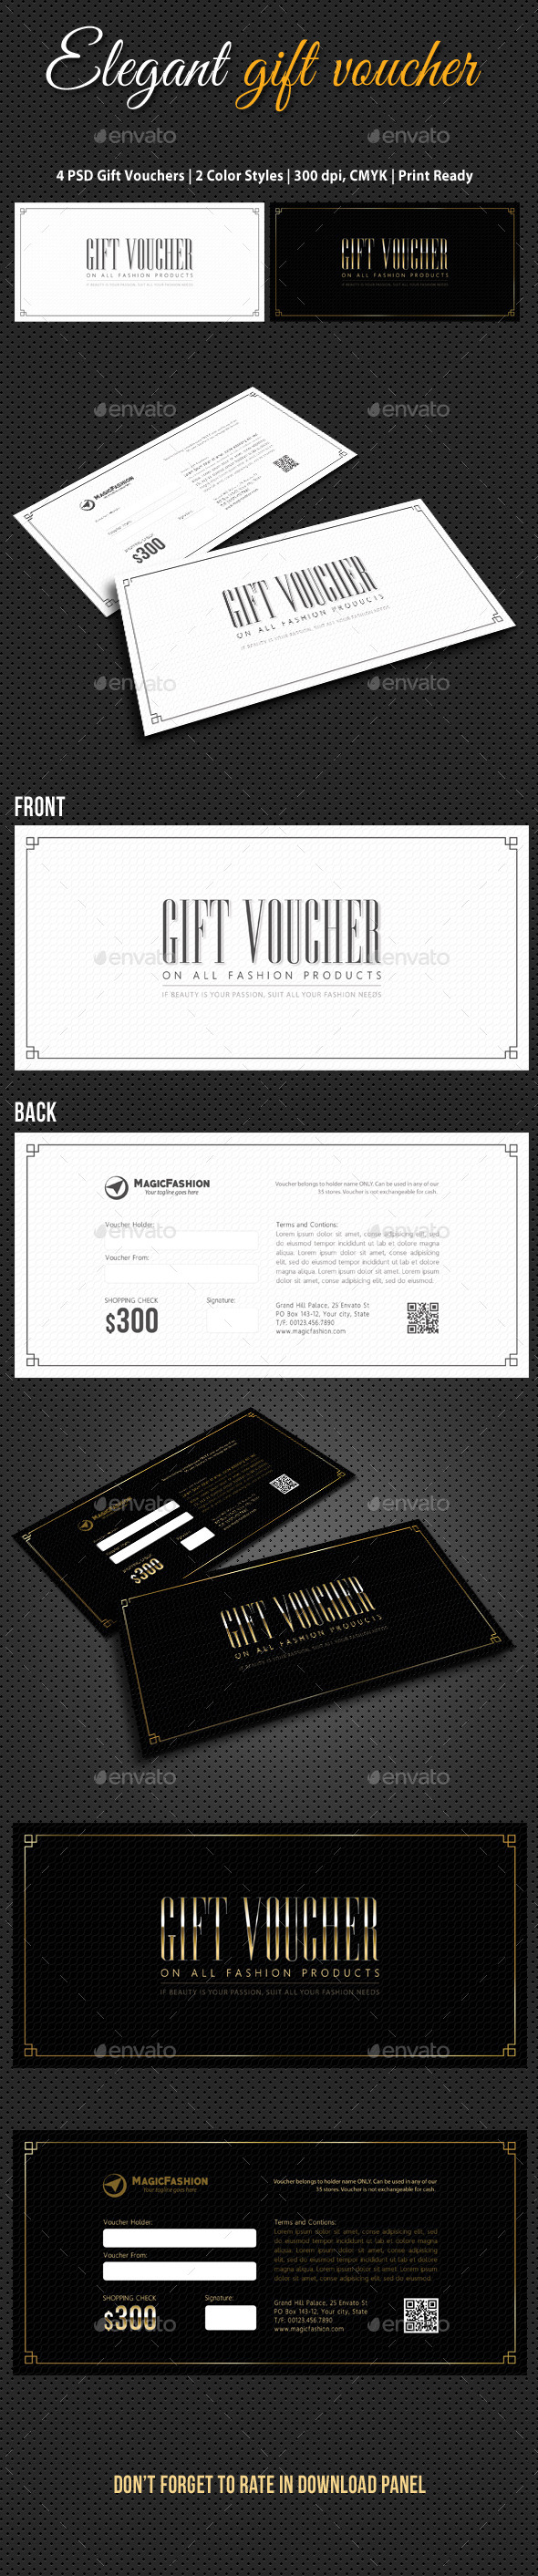 GraphicRiver Elegant Gift Voucher V02 10530239